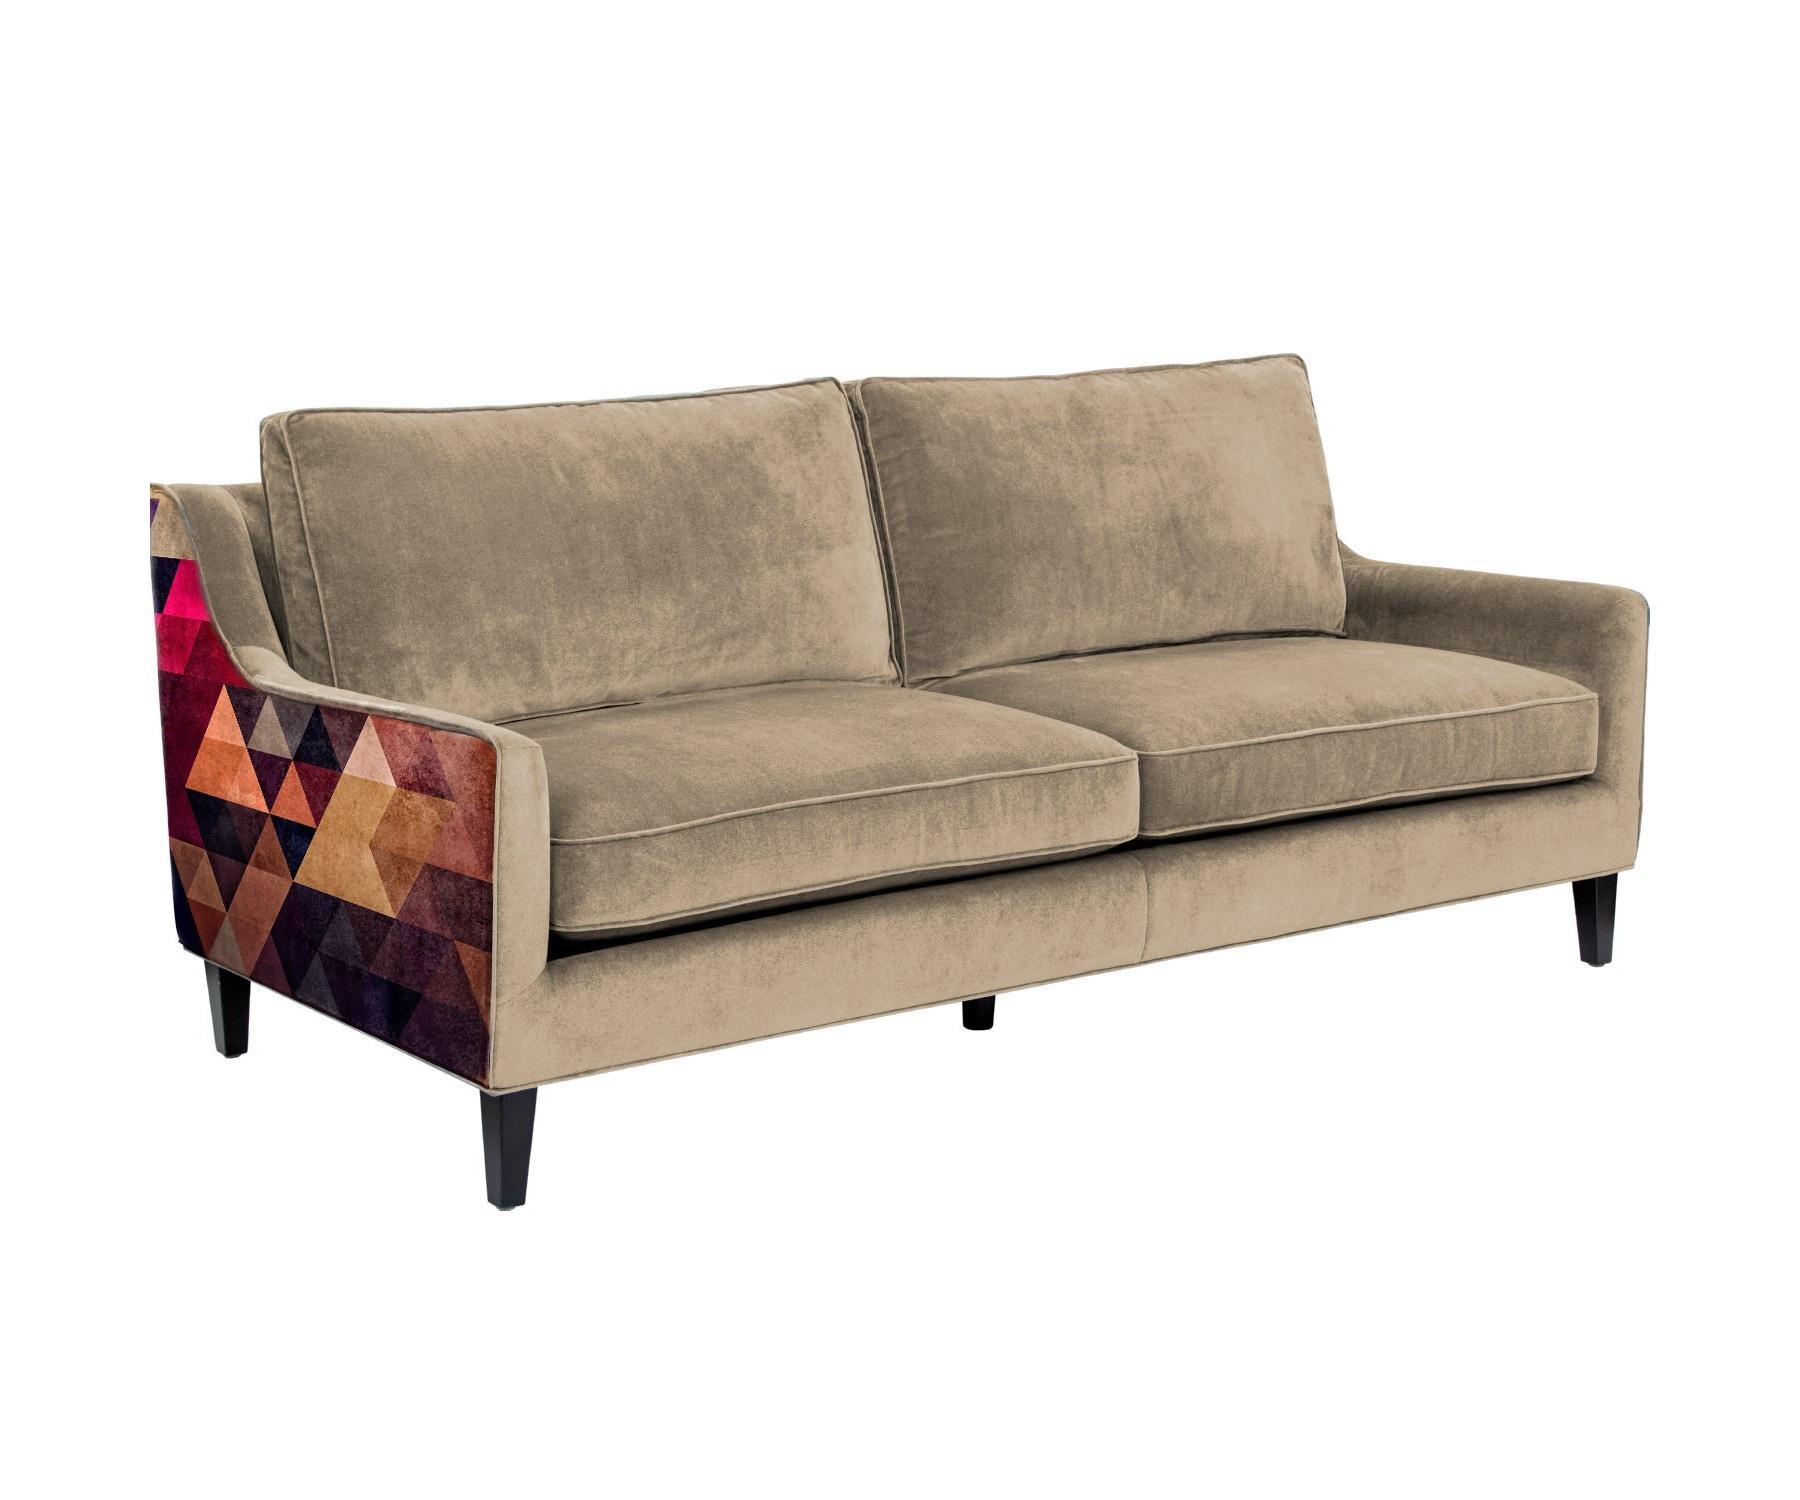 Icon designe диван triangle бежевый  65836/9